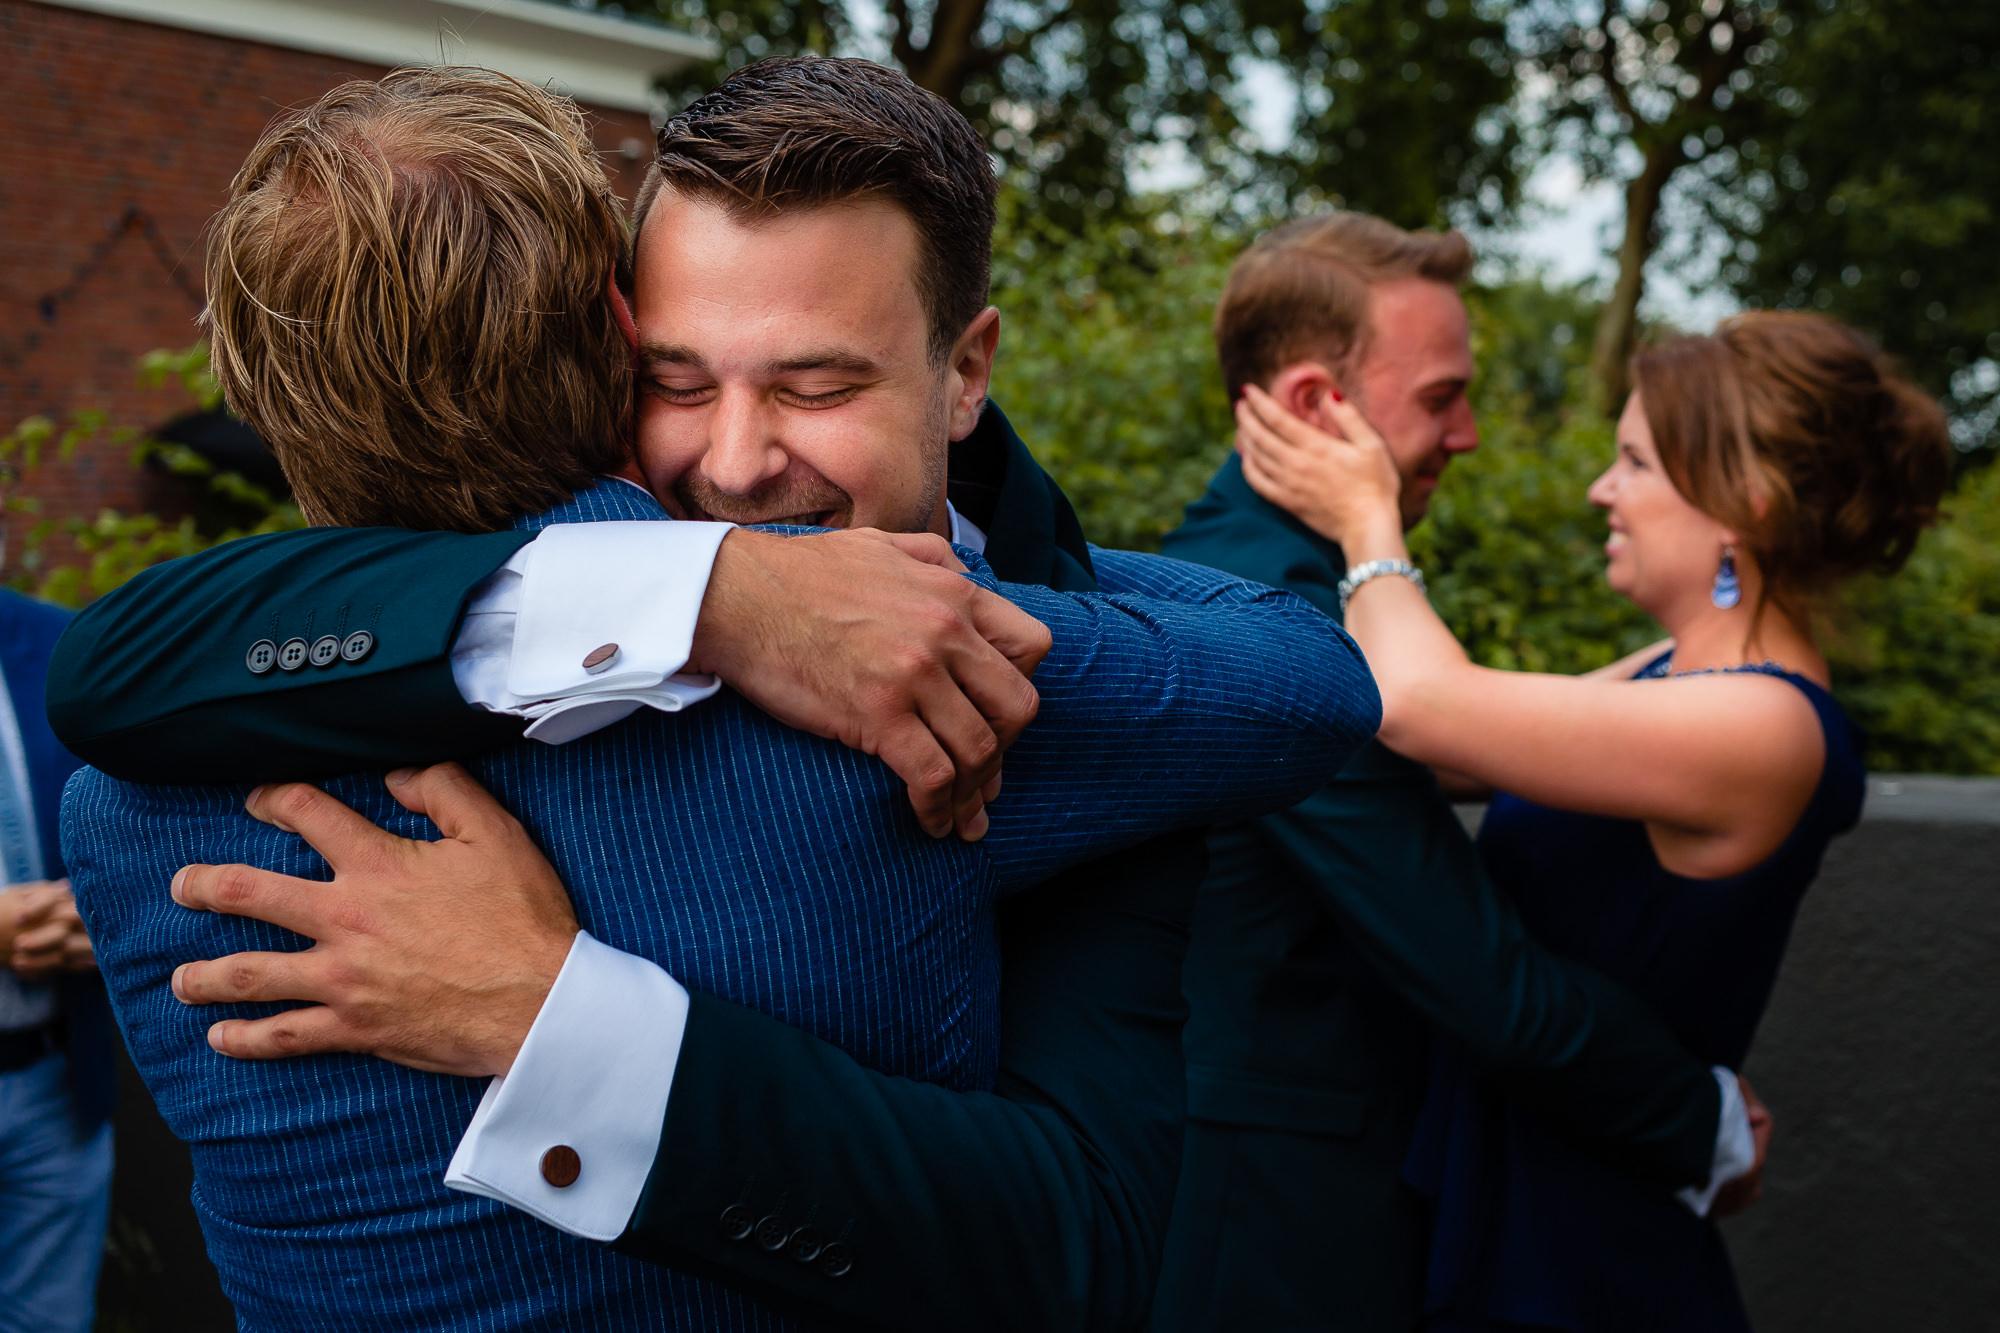 Bruidegoms worden beiden geëmotioneerd geknuffeld